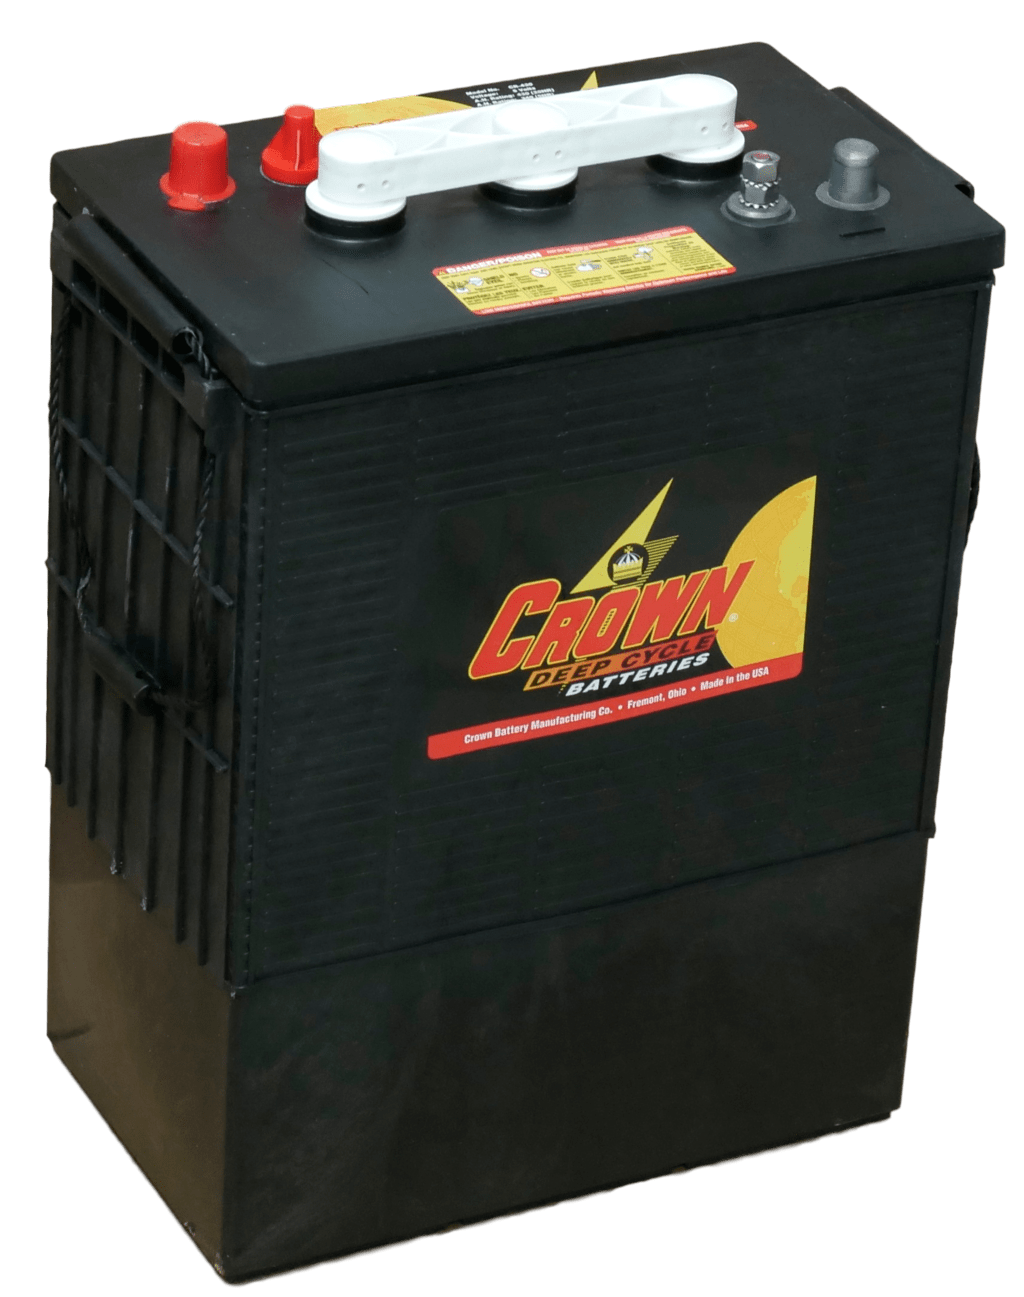 Crown 860AH 24VDC 20,640 Wh (8) Battery Bank